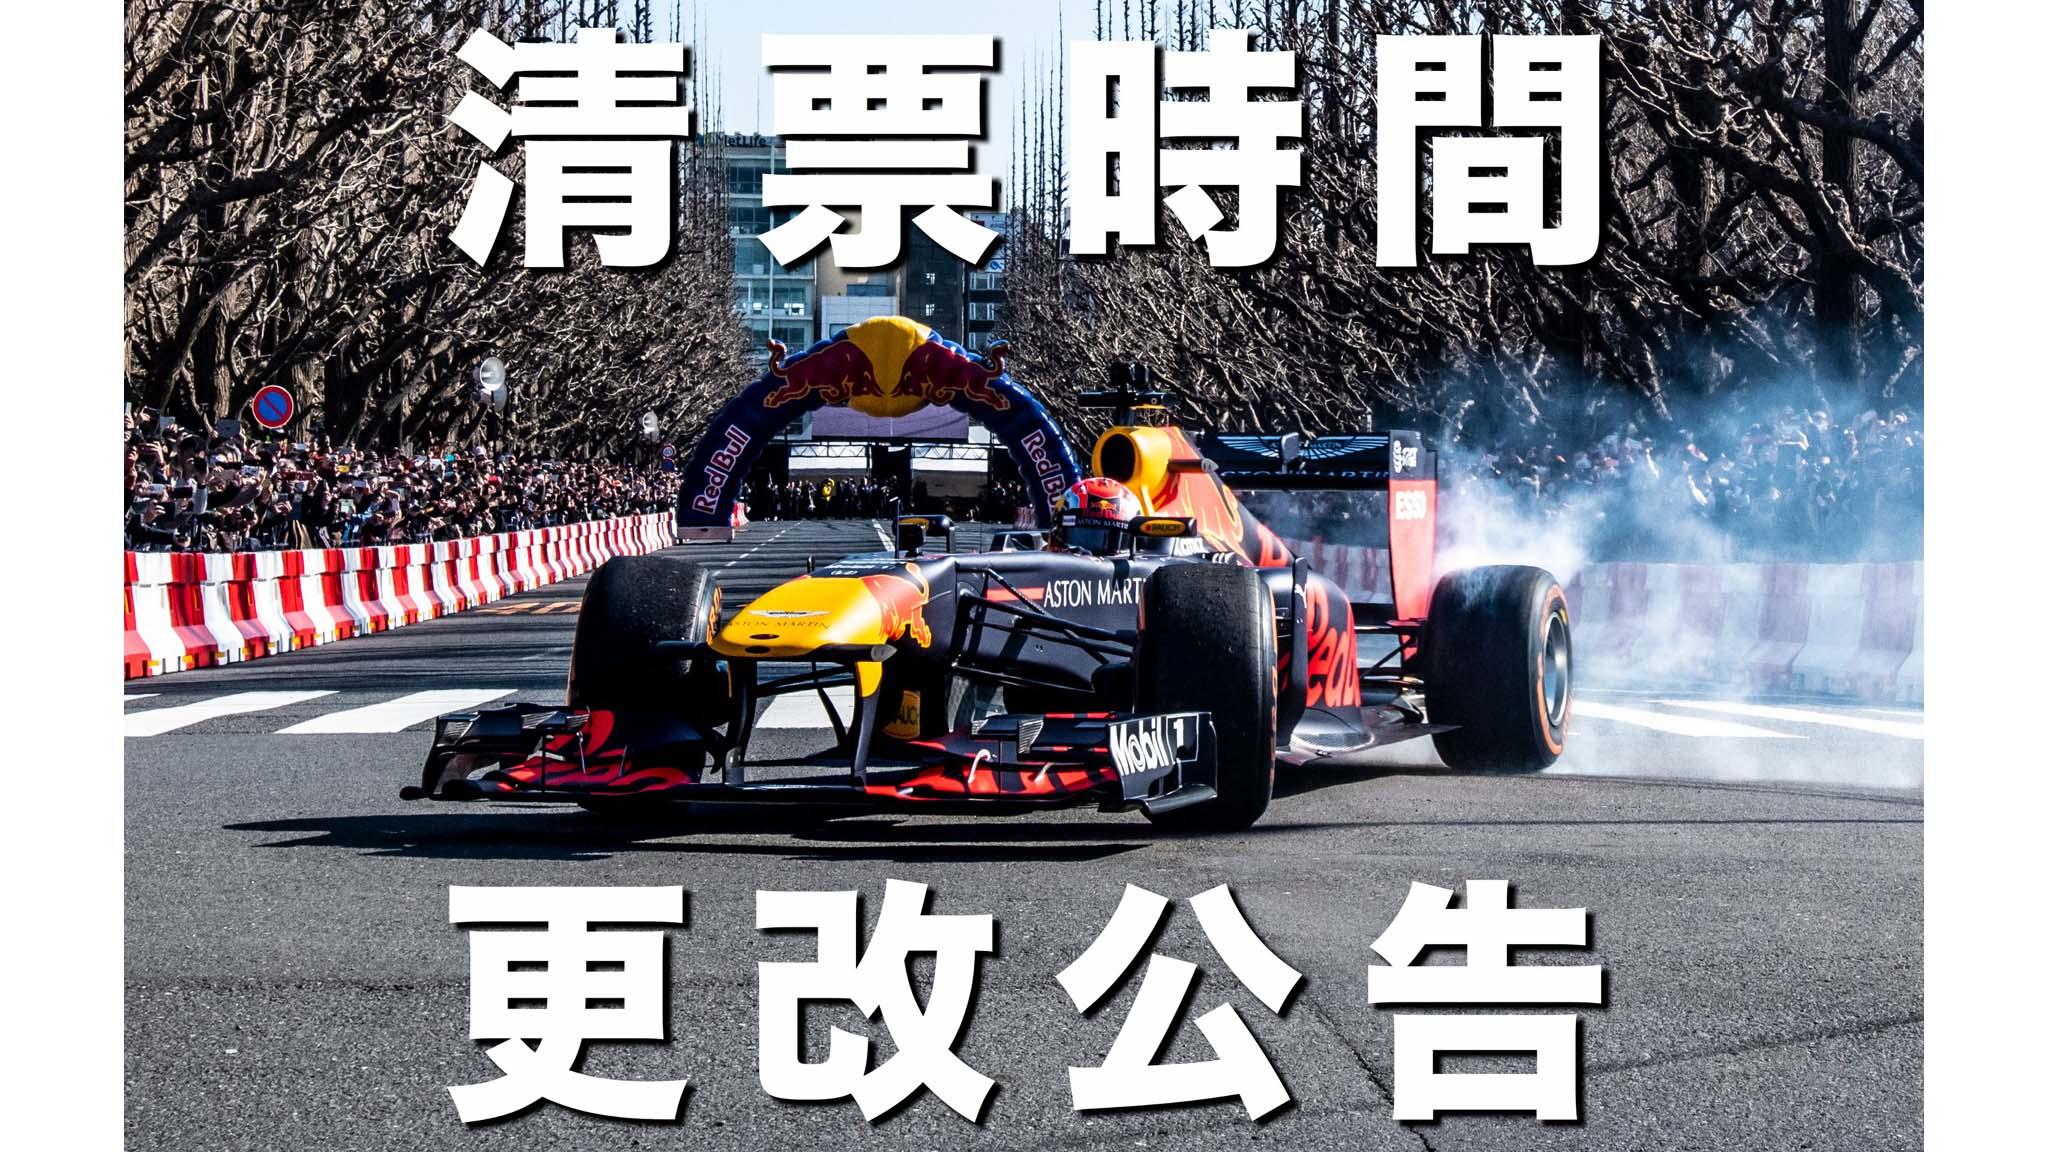 2020 Red Bull Racing Showrun 清票時間更改公告!2/12 最後搶票機會!